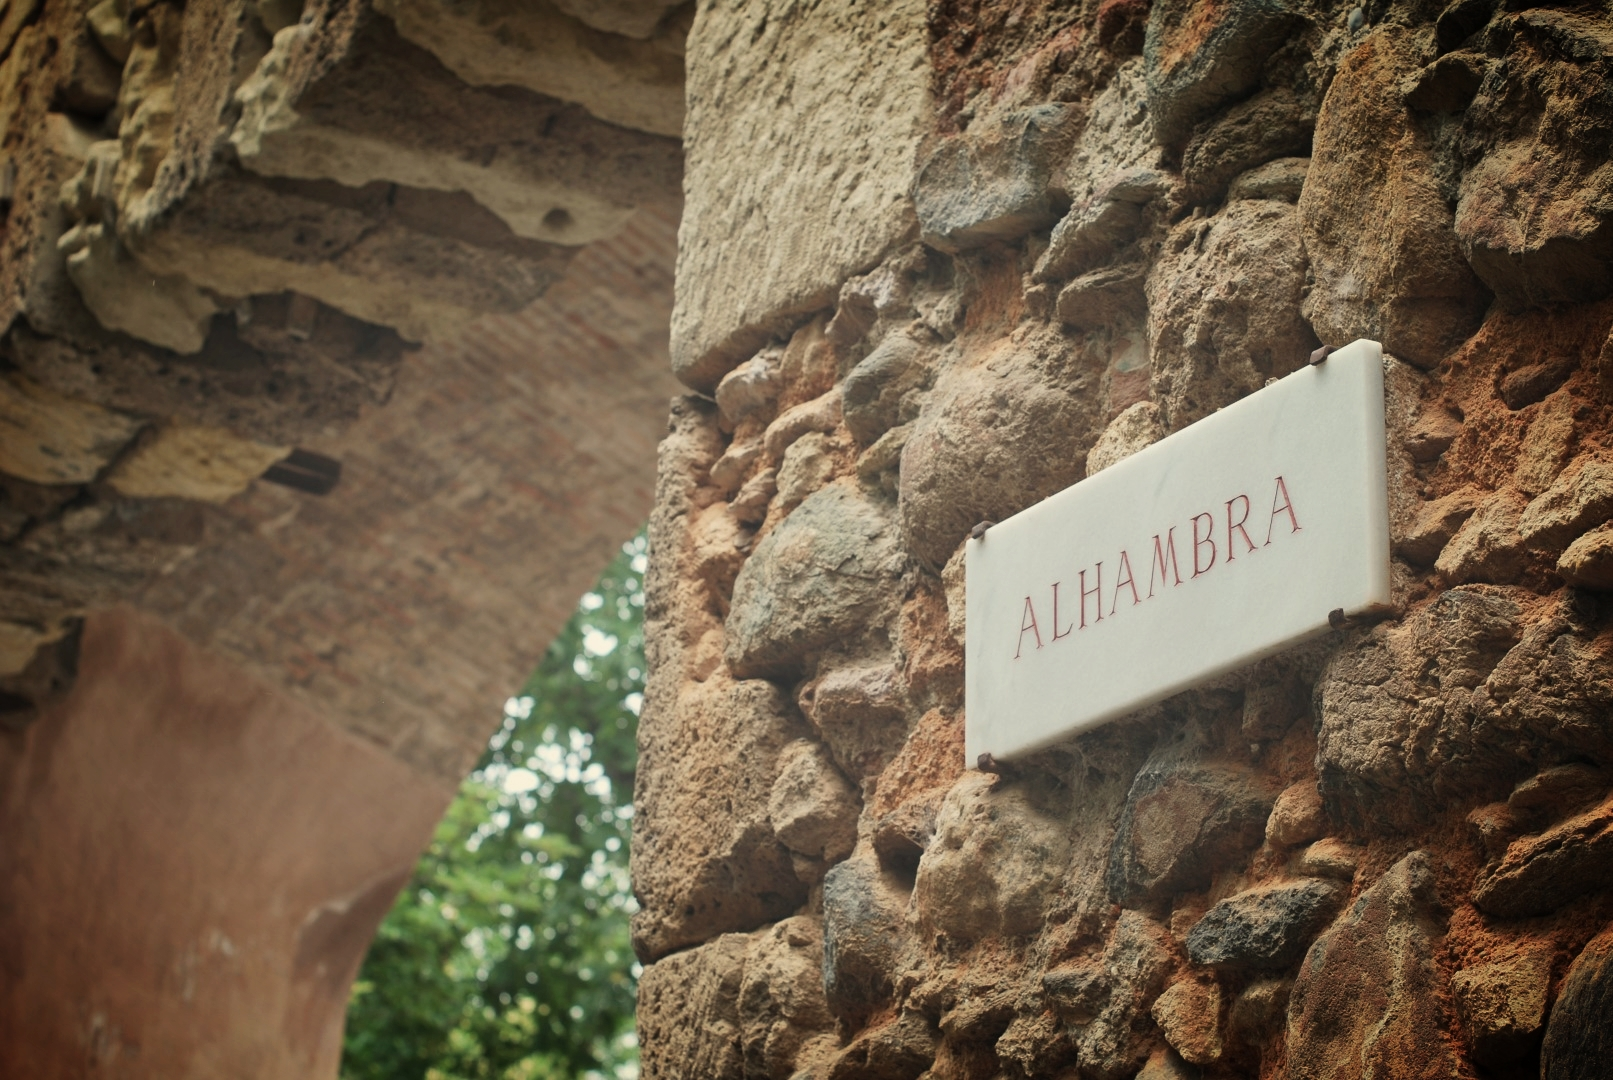 Alhambra Lugares de Interes Benahavis